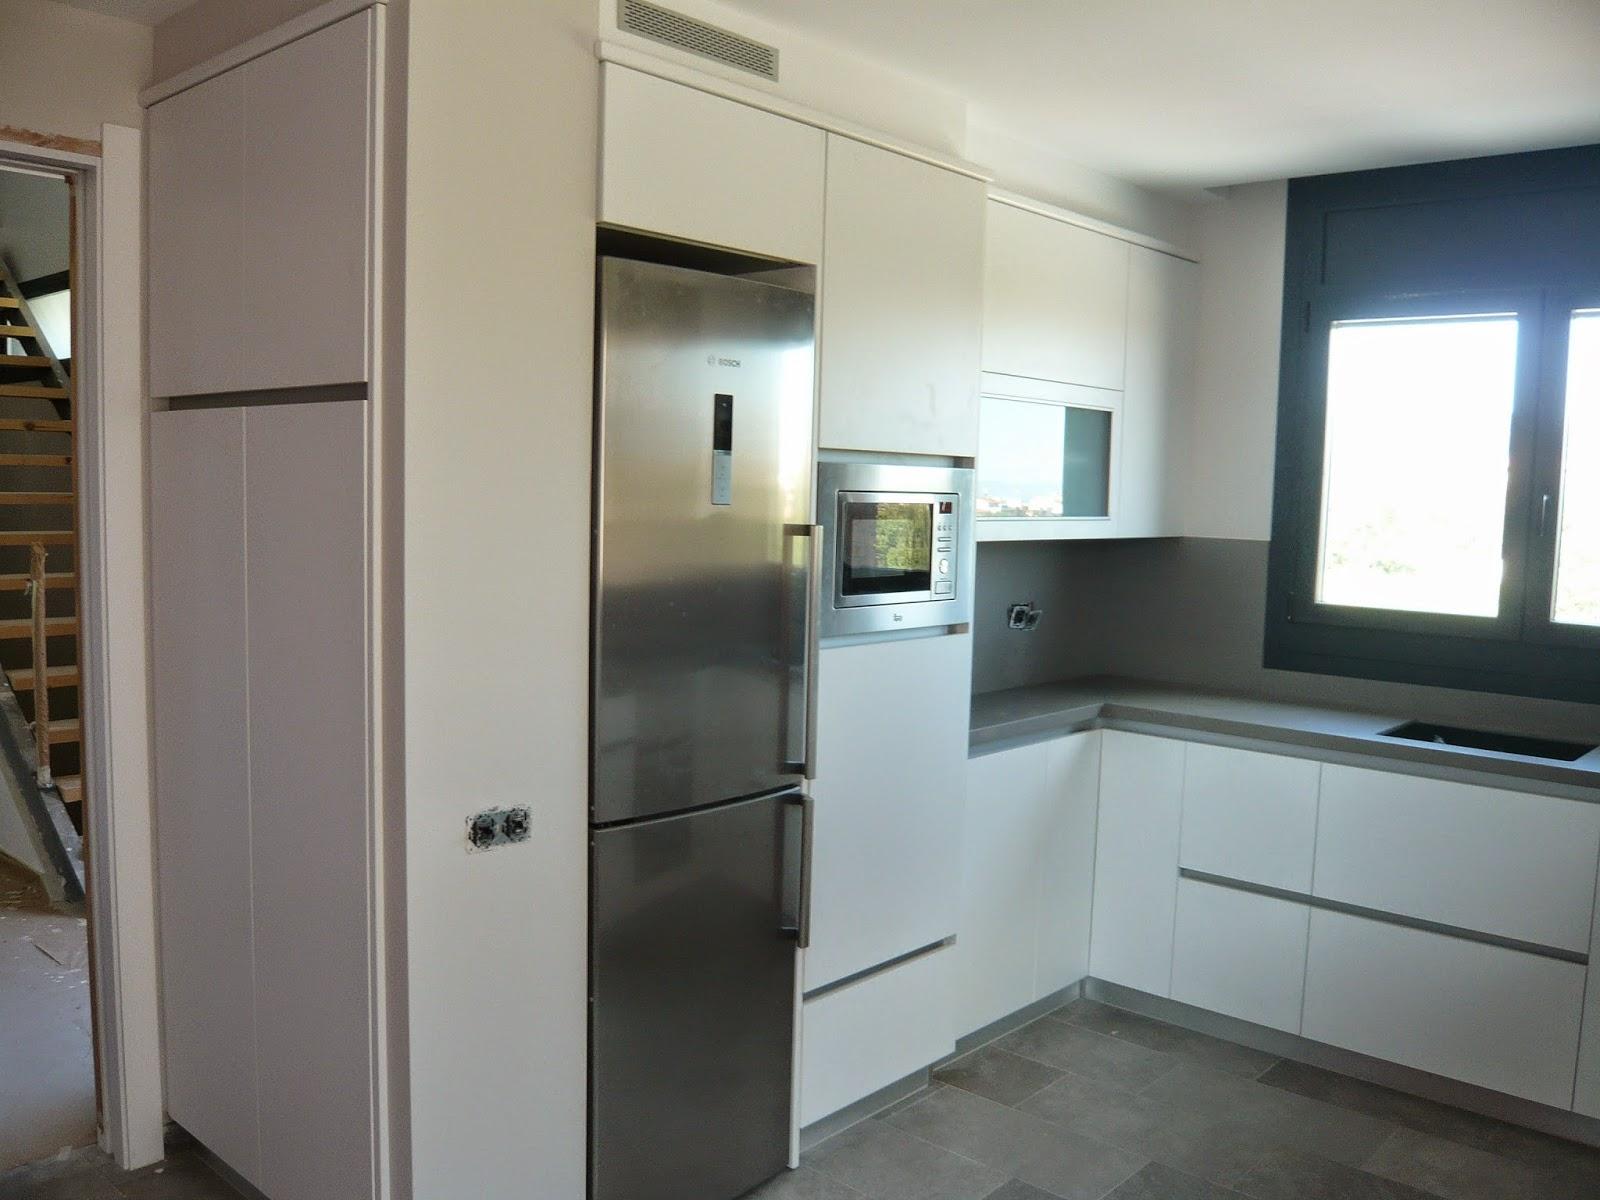 Reuscuina muebles de cocina formica blanca sin tiradores - Muebles de cocina de formica ...